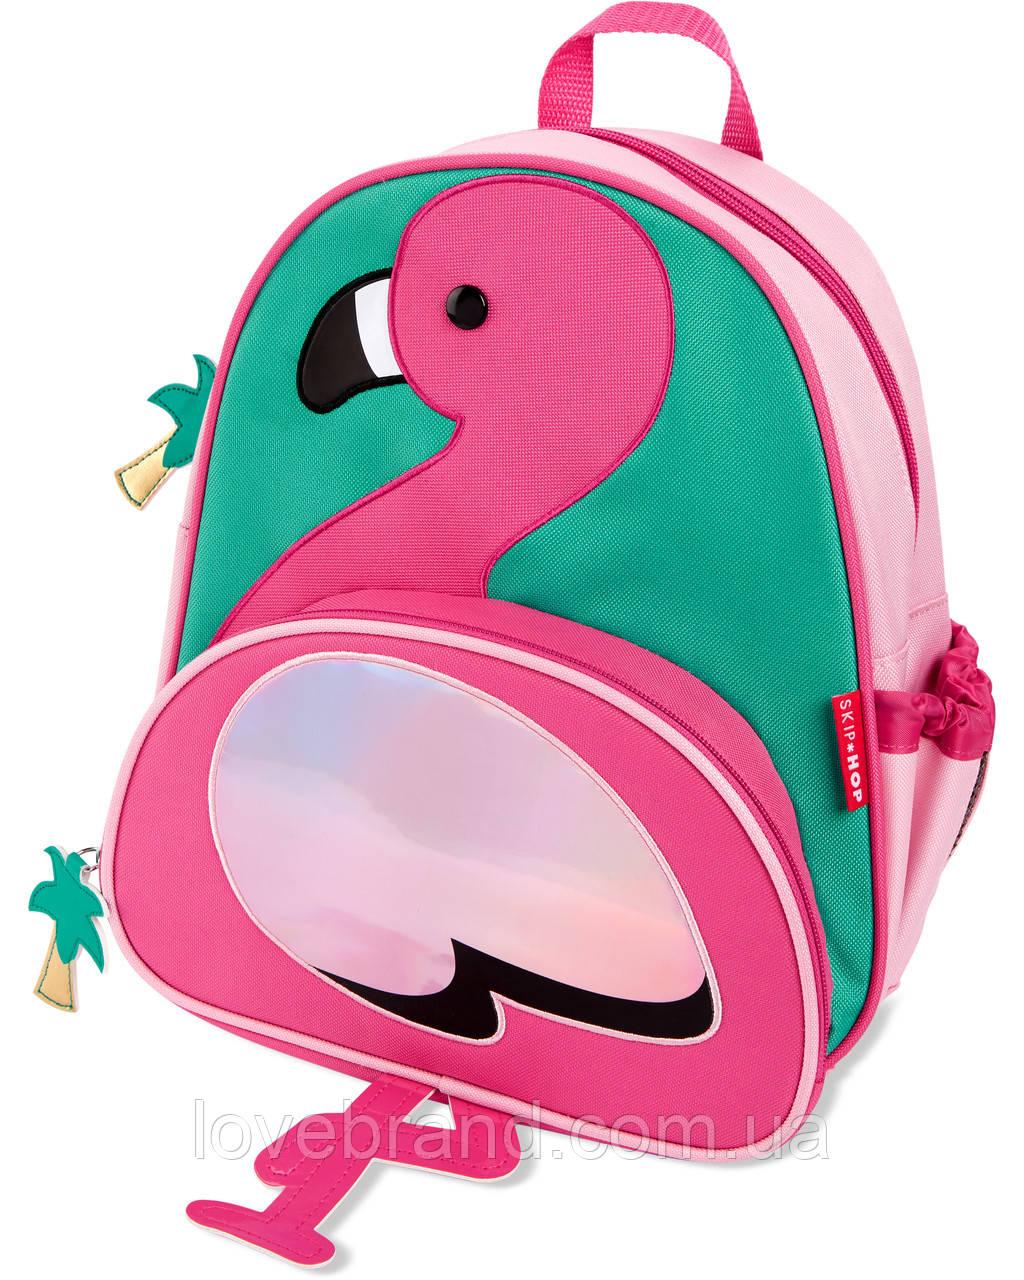 "Рюкзак для девочки SkipHop ""Фламинго"" , рюкзачок детский Скип Хоп с фламинго ОРИГИНАЛ"